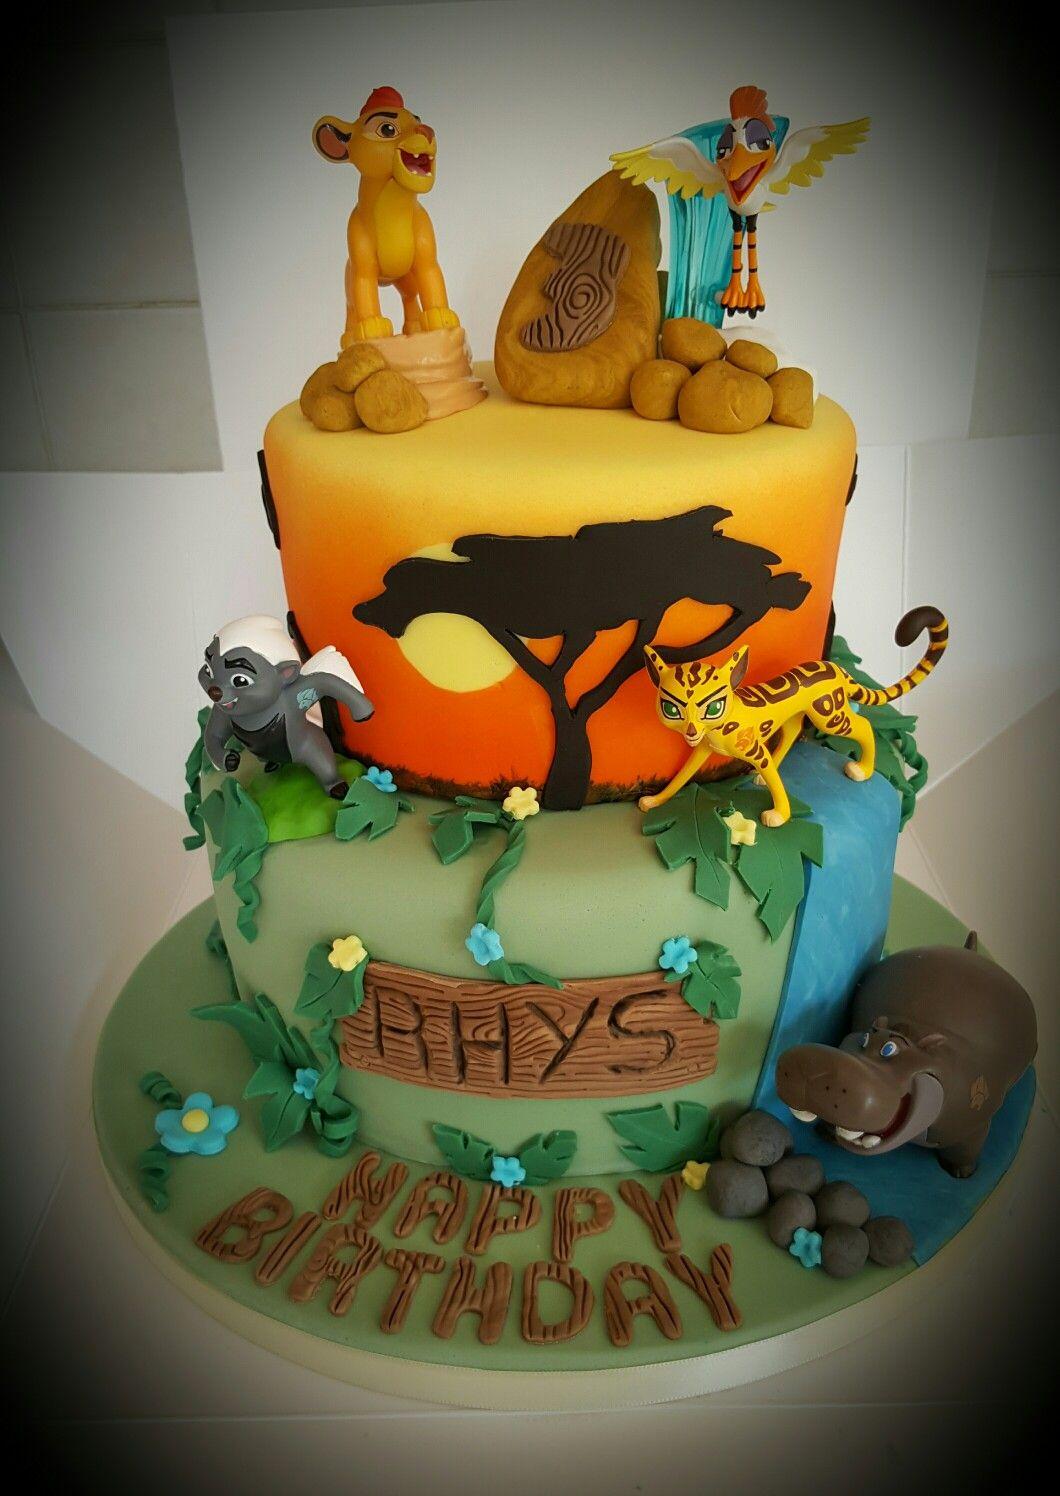 Lion King Cake Decorations Uk : Lion guard Birthday Ideas:) Pinterest Lions ...